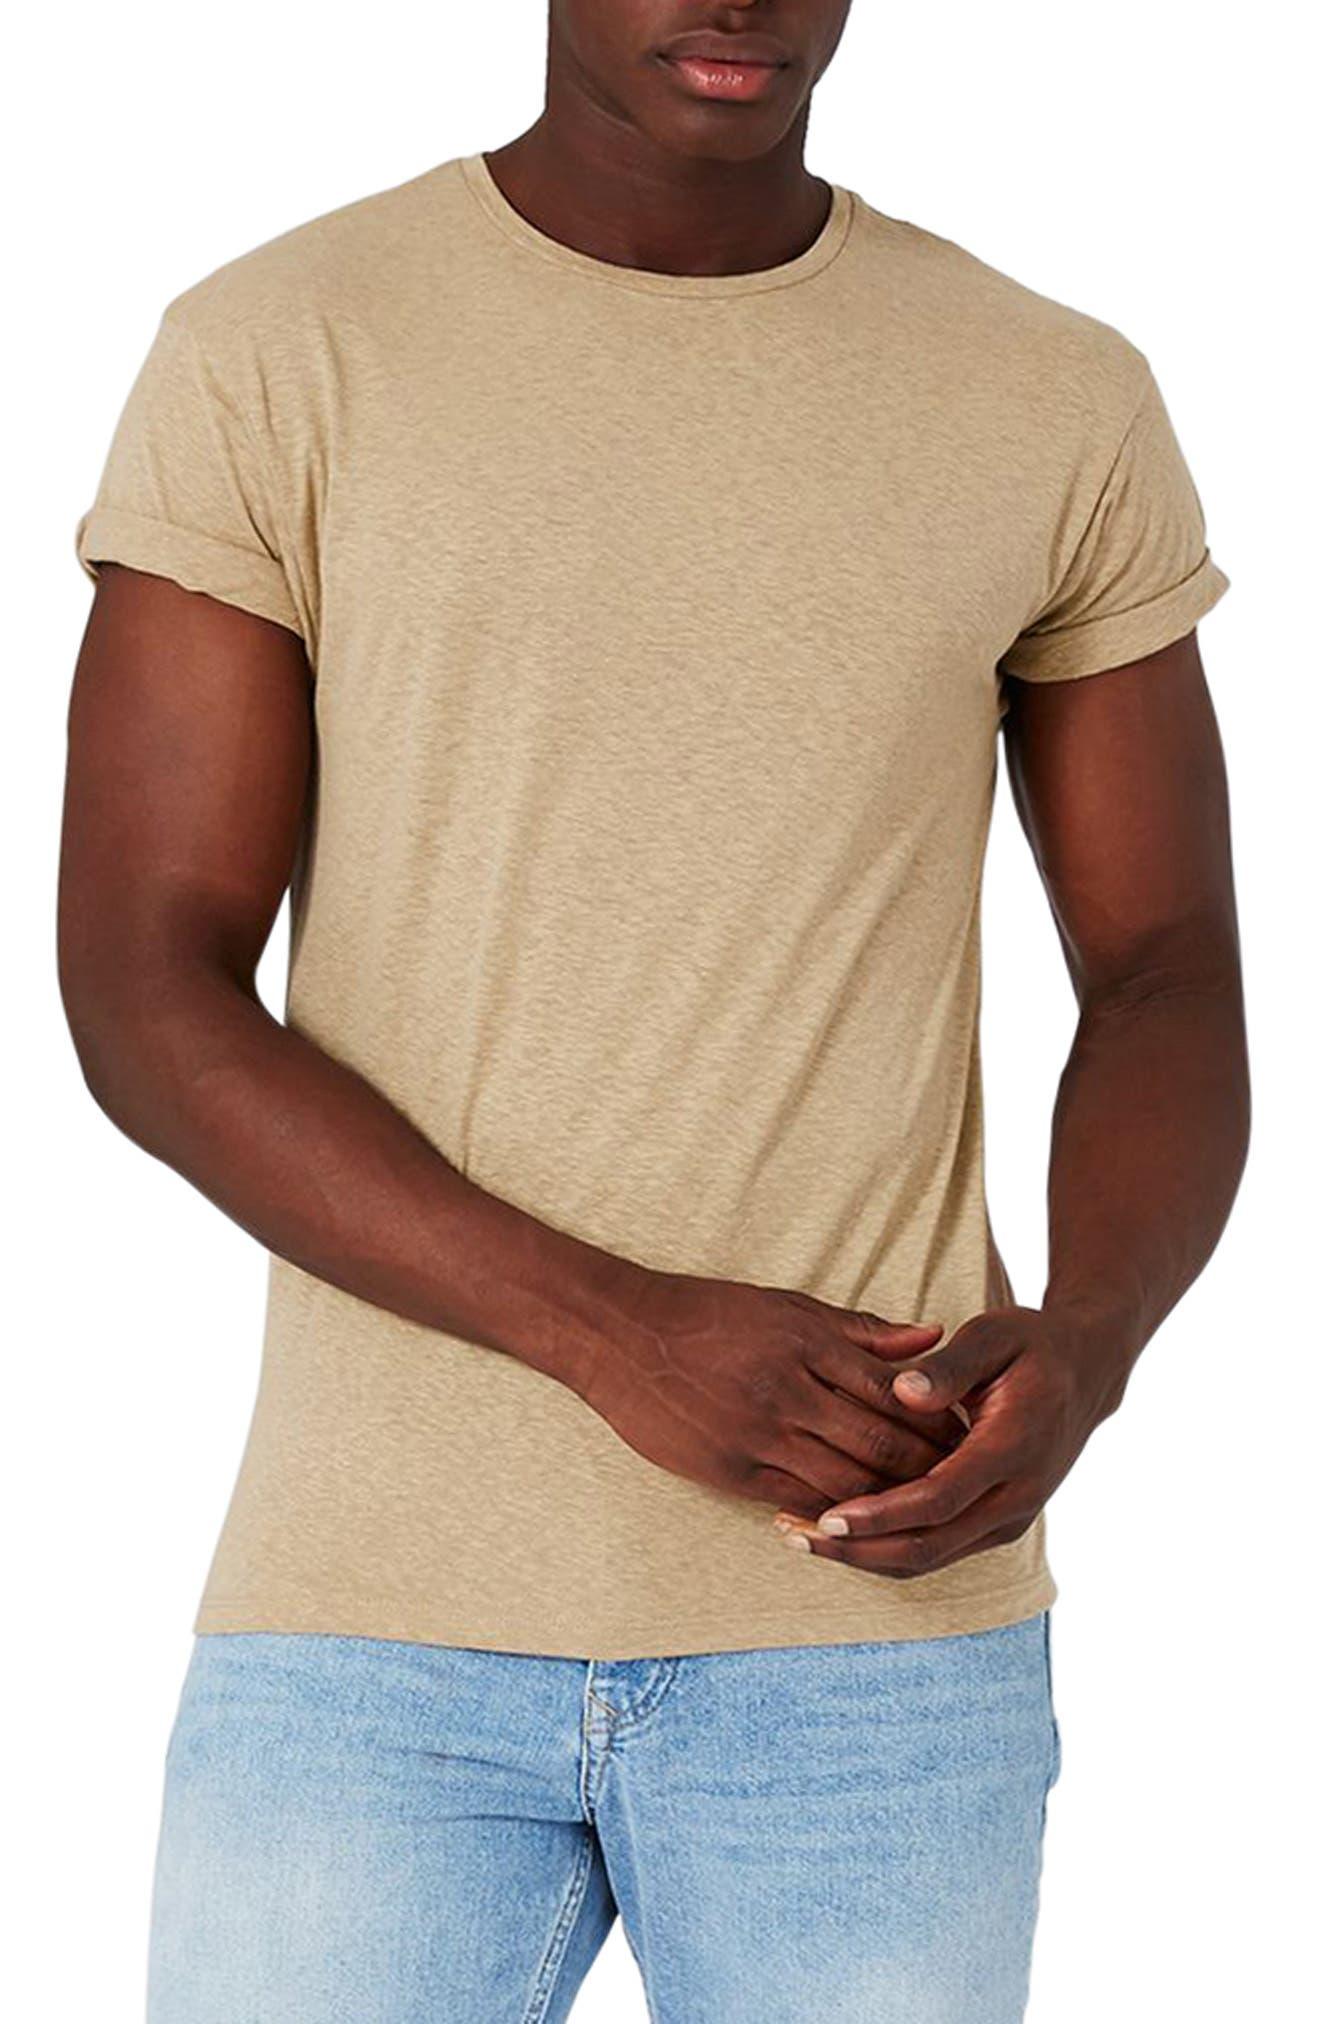 TOPMAN Mr. Muscle Fit Roll Sleeve Linen T-Shirt